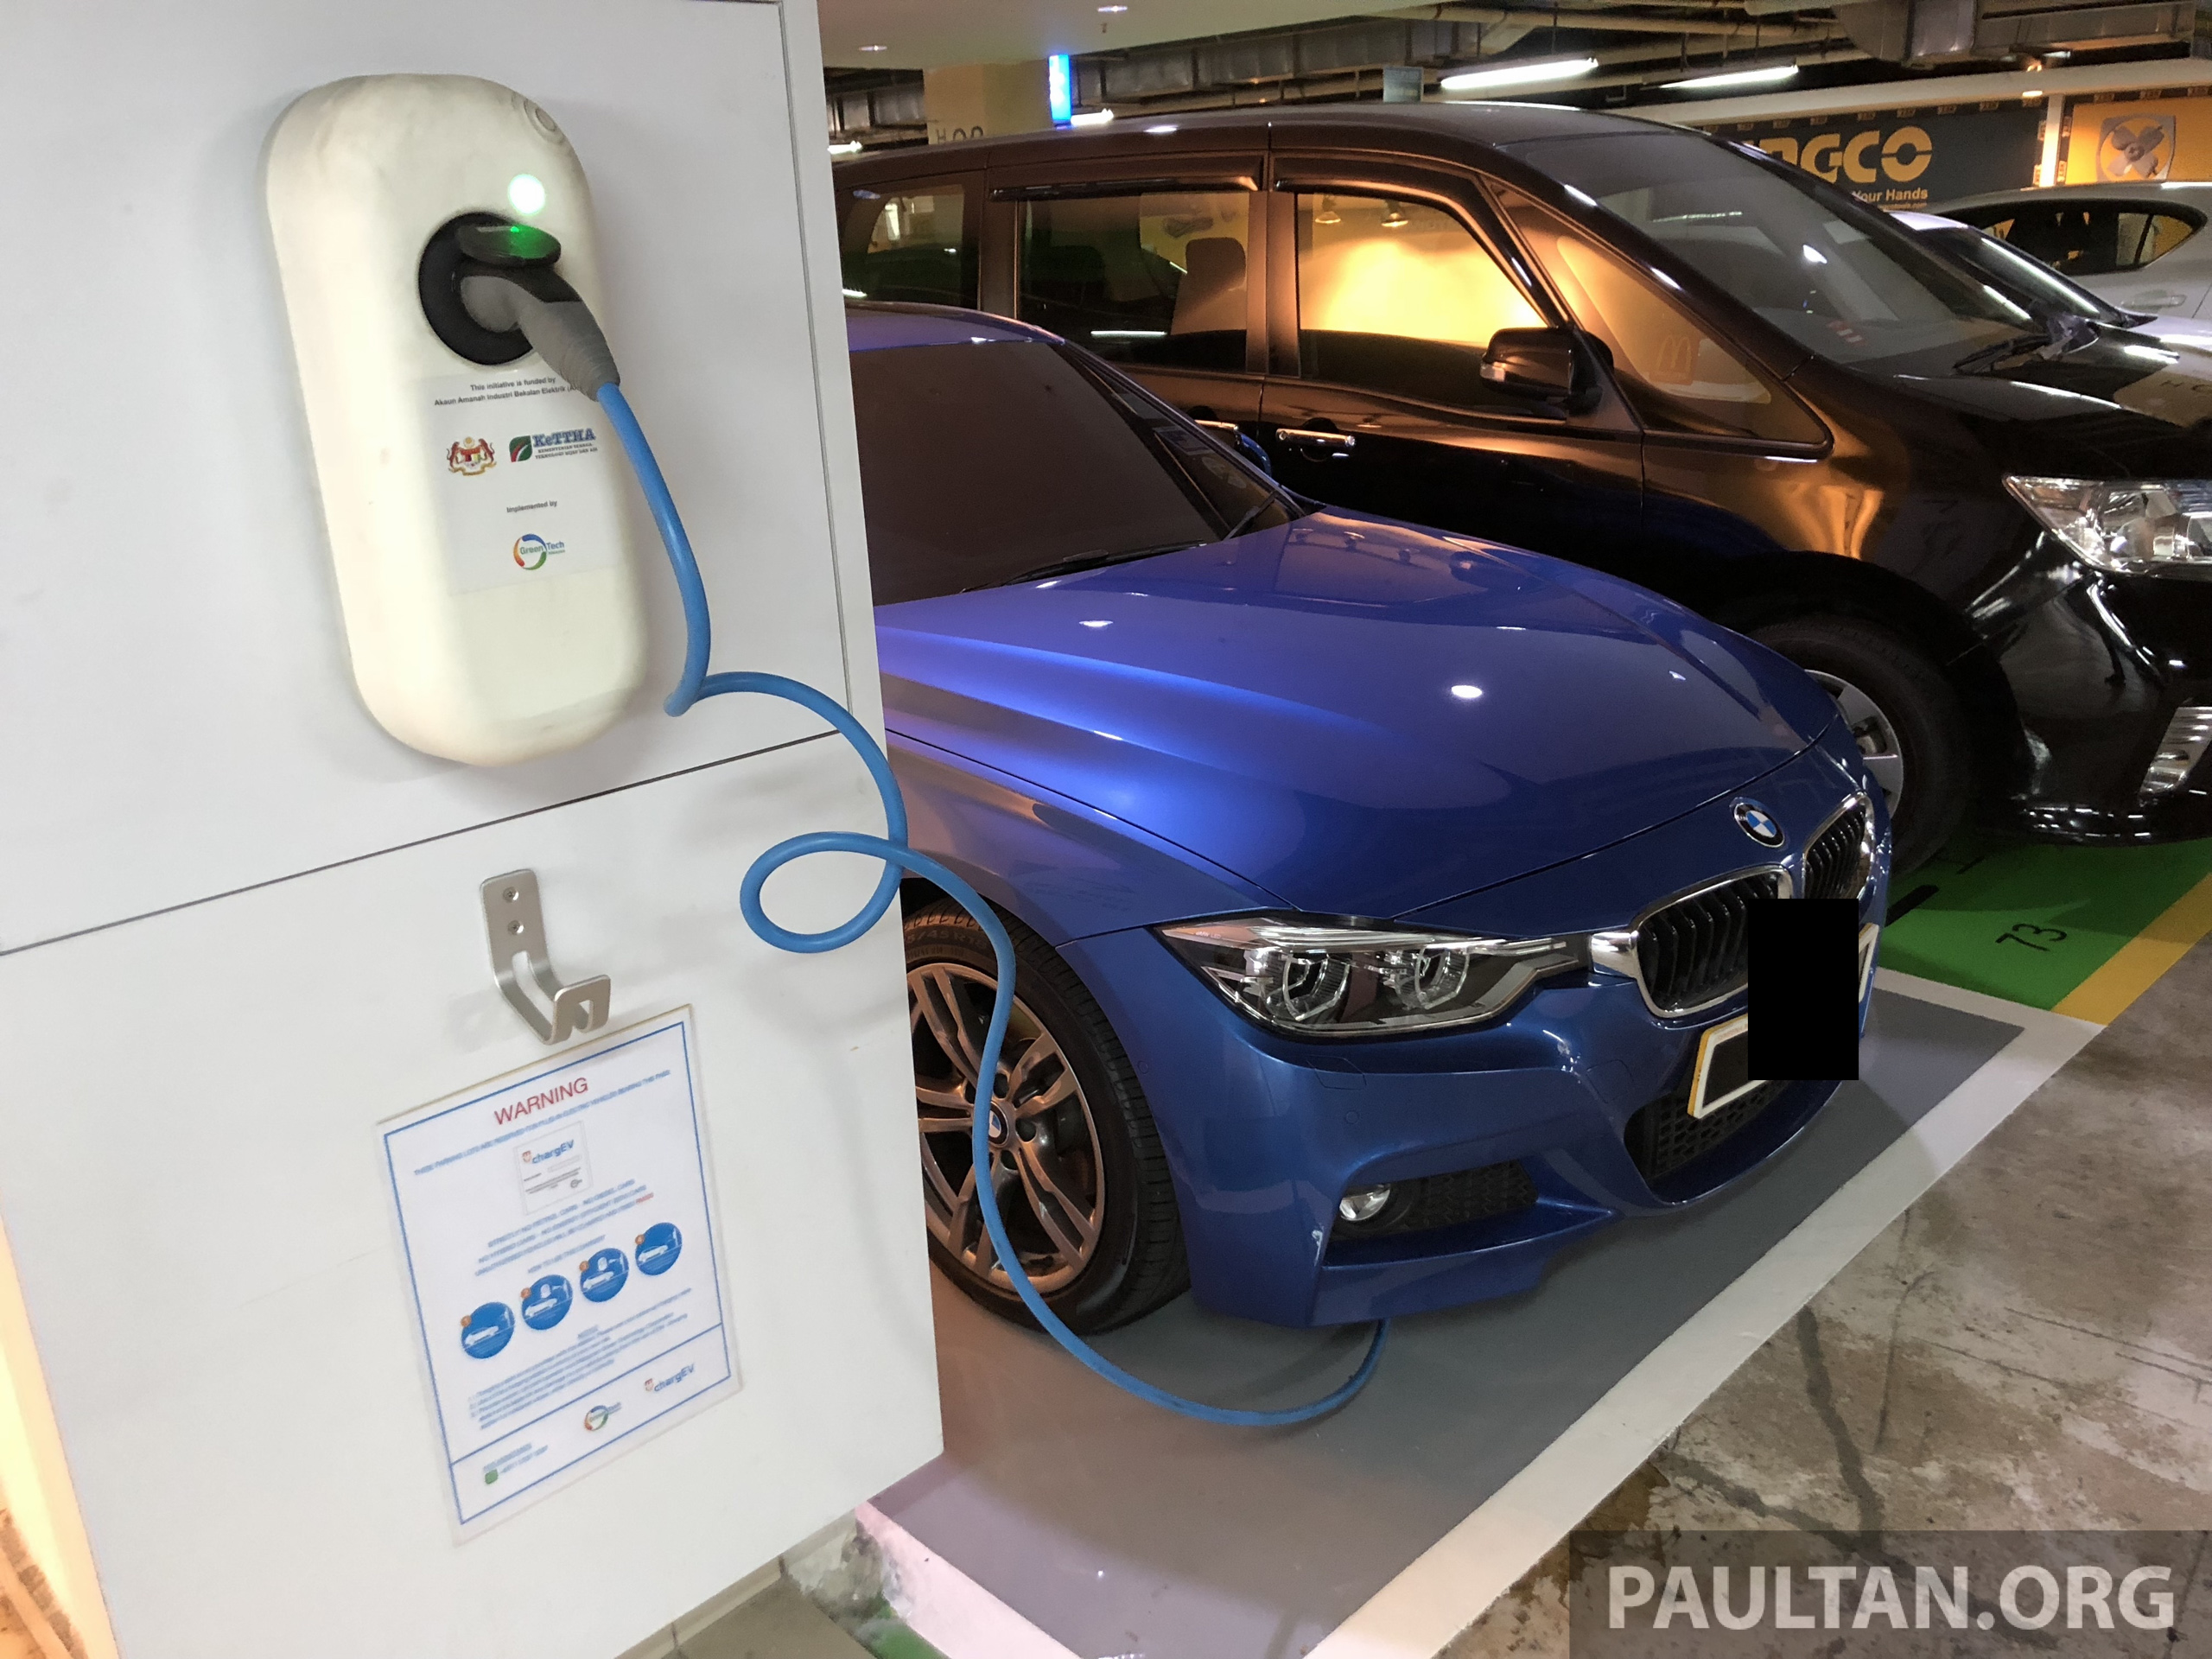 Public charging station etiquette 101 - some pointers